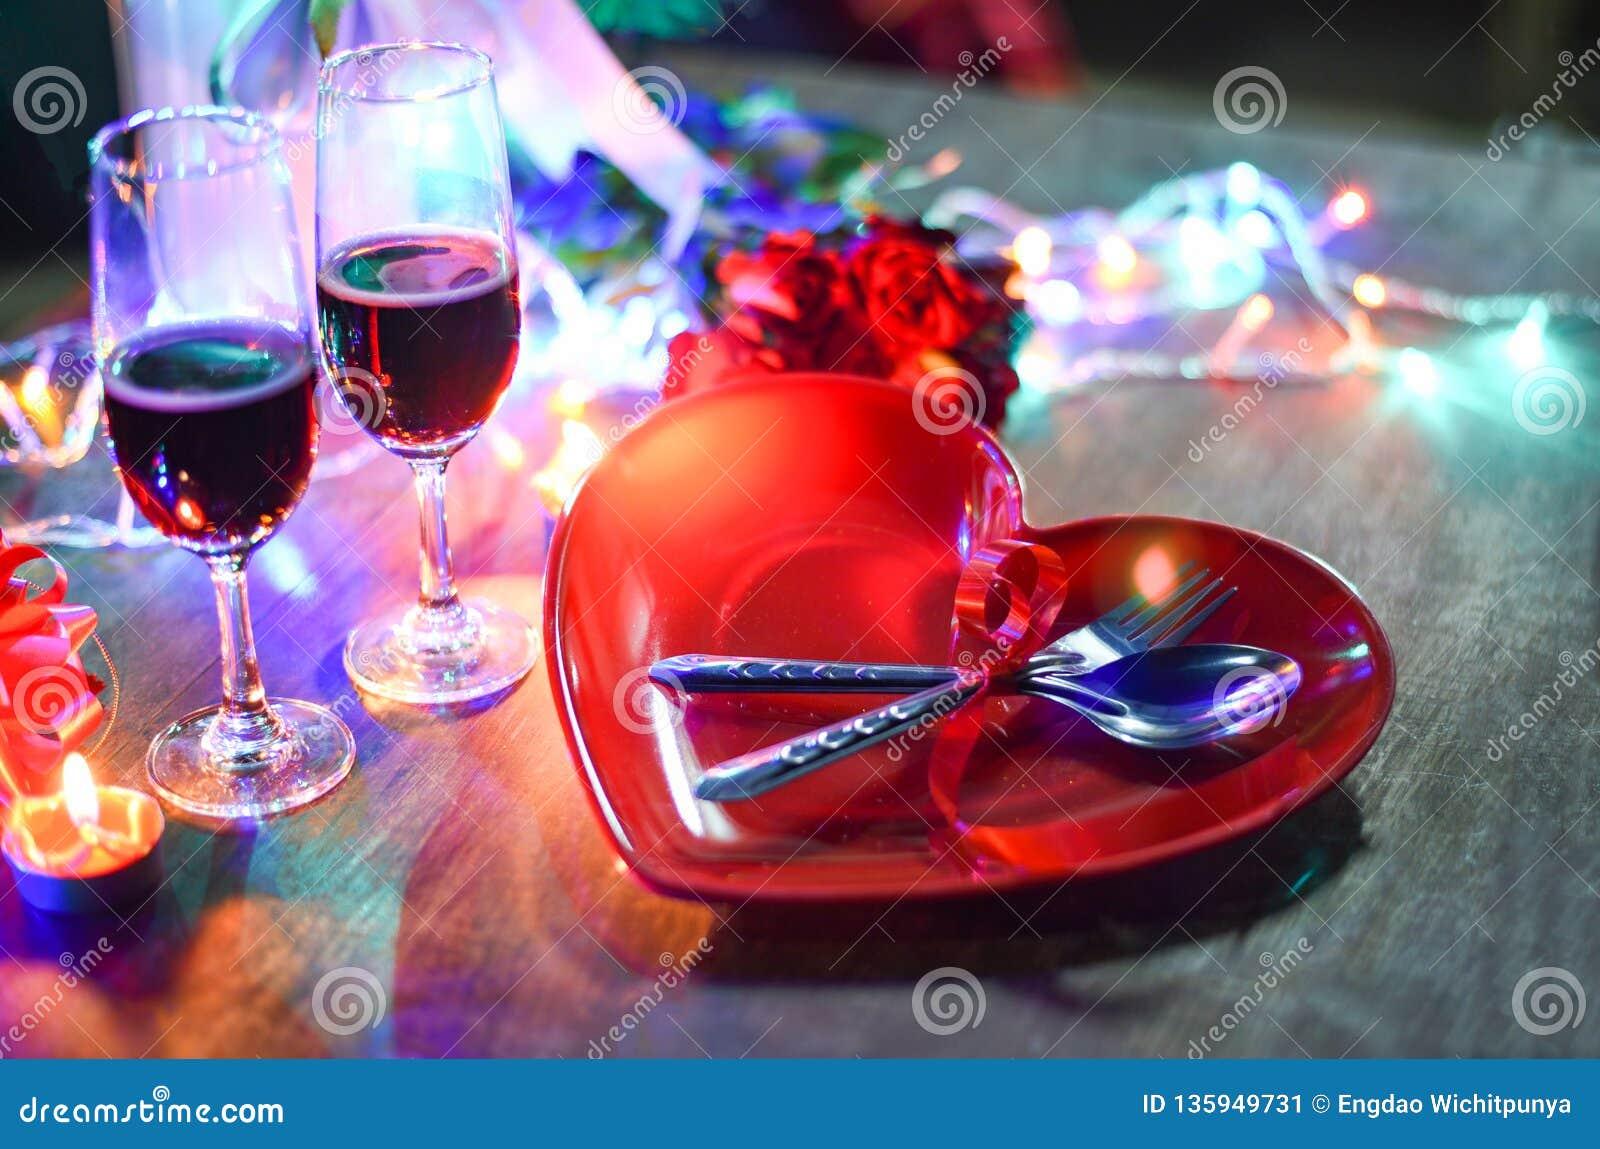 Swell Valentines Dinner Romantic Love Concept Romantic Table Stock Download Free Architecture Designs Scobabritishbridgeorg